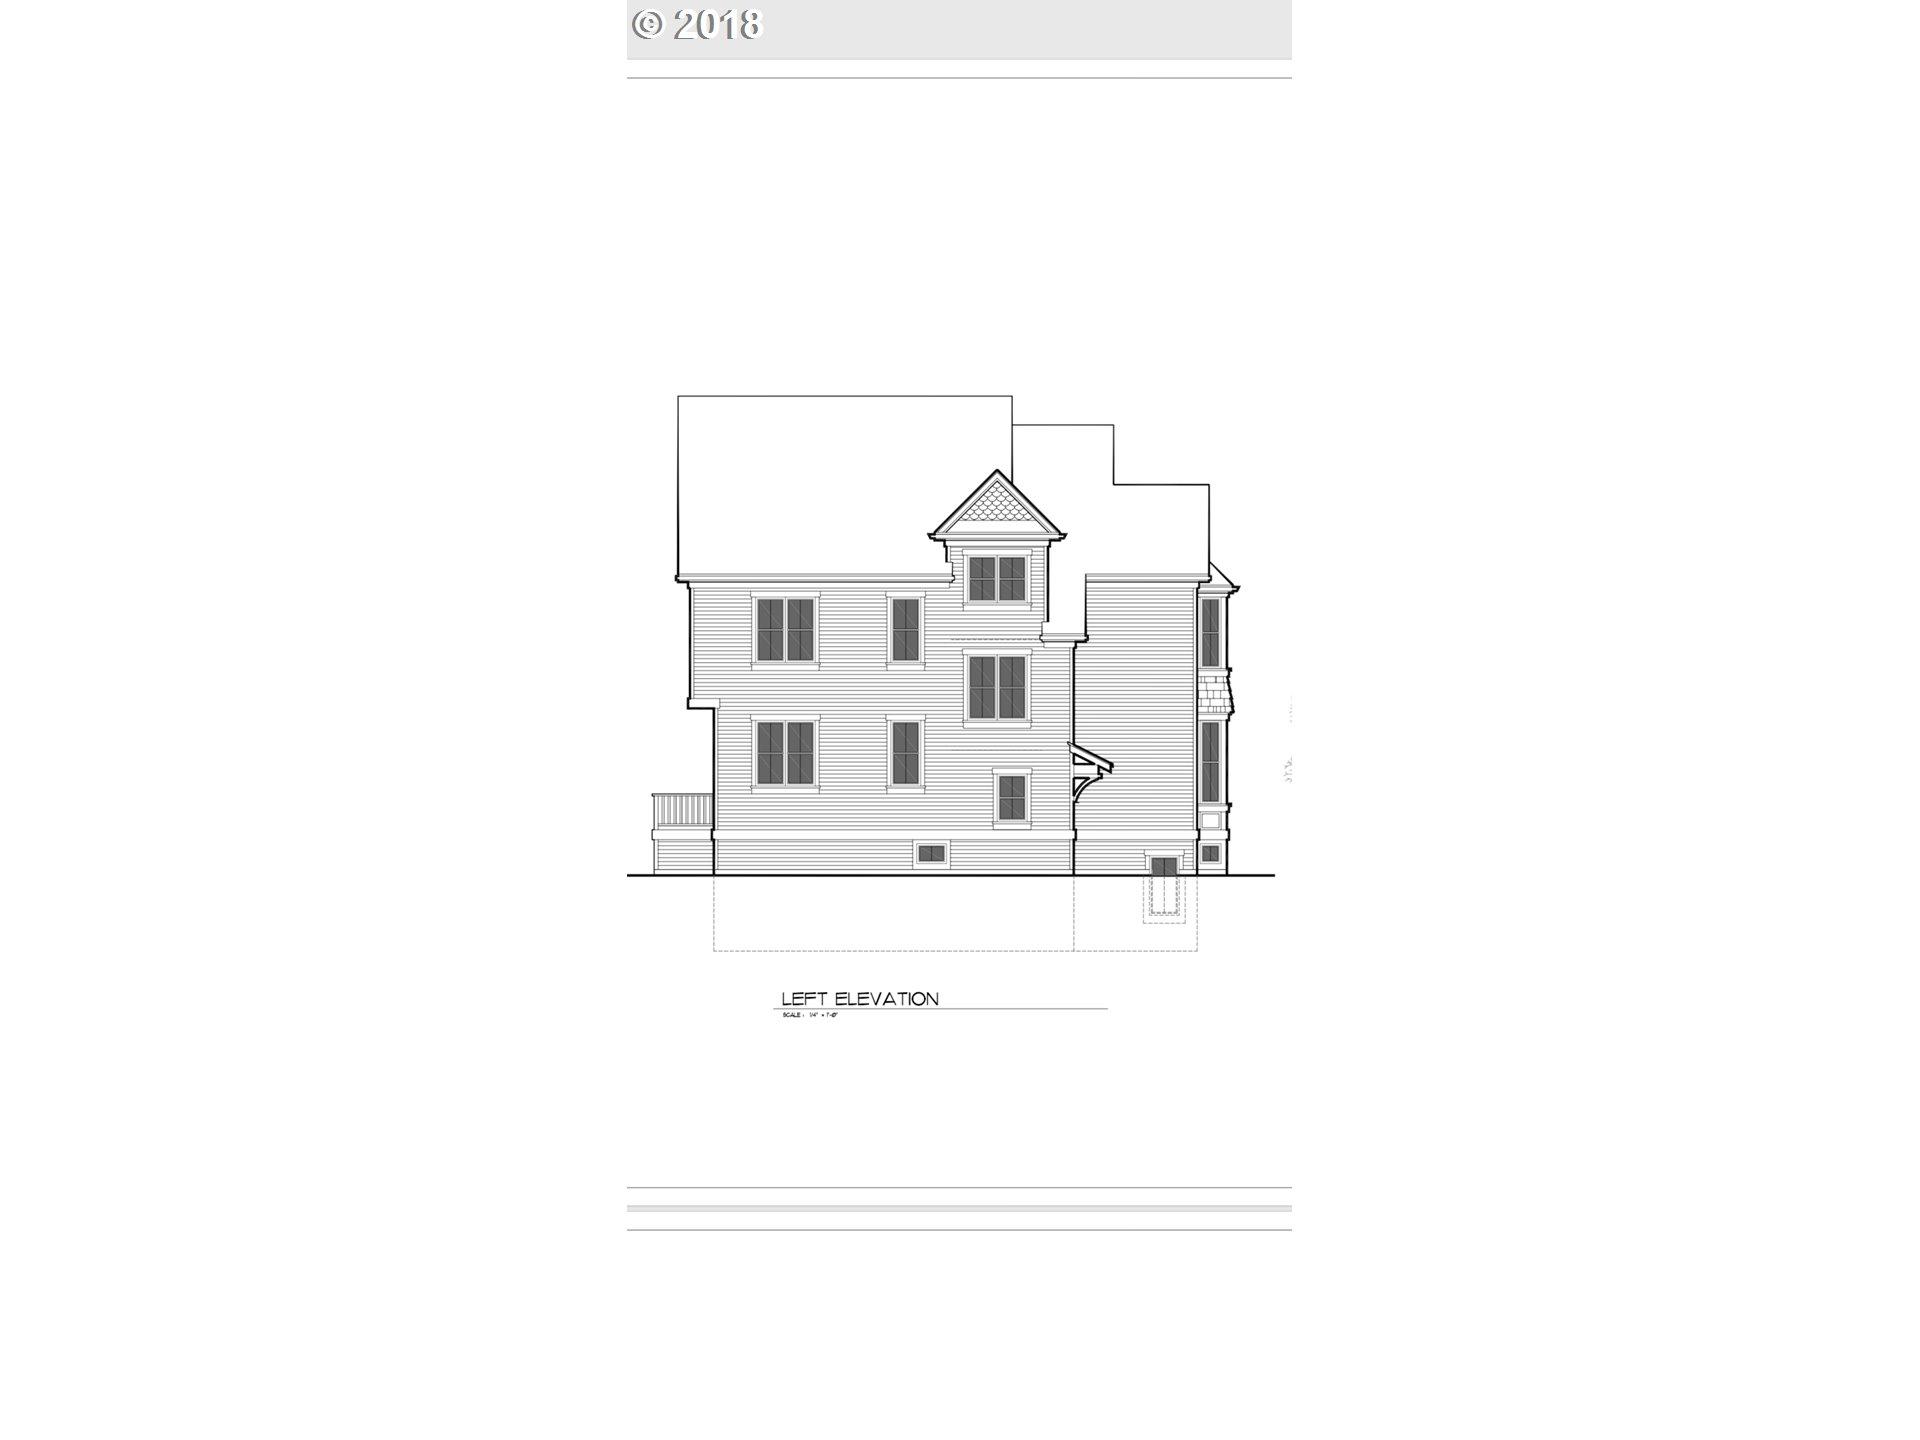 15 SW GIBBS ST Portland, OR 97239 - MLS #: 18594012